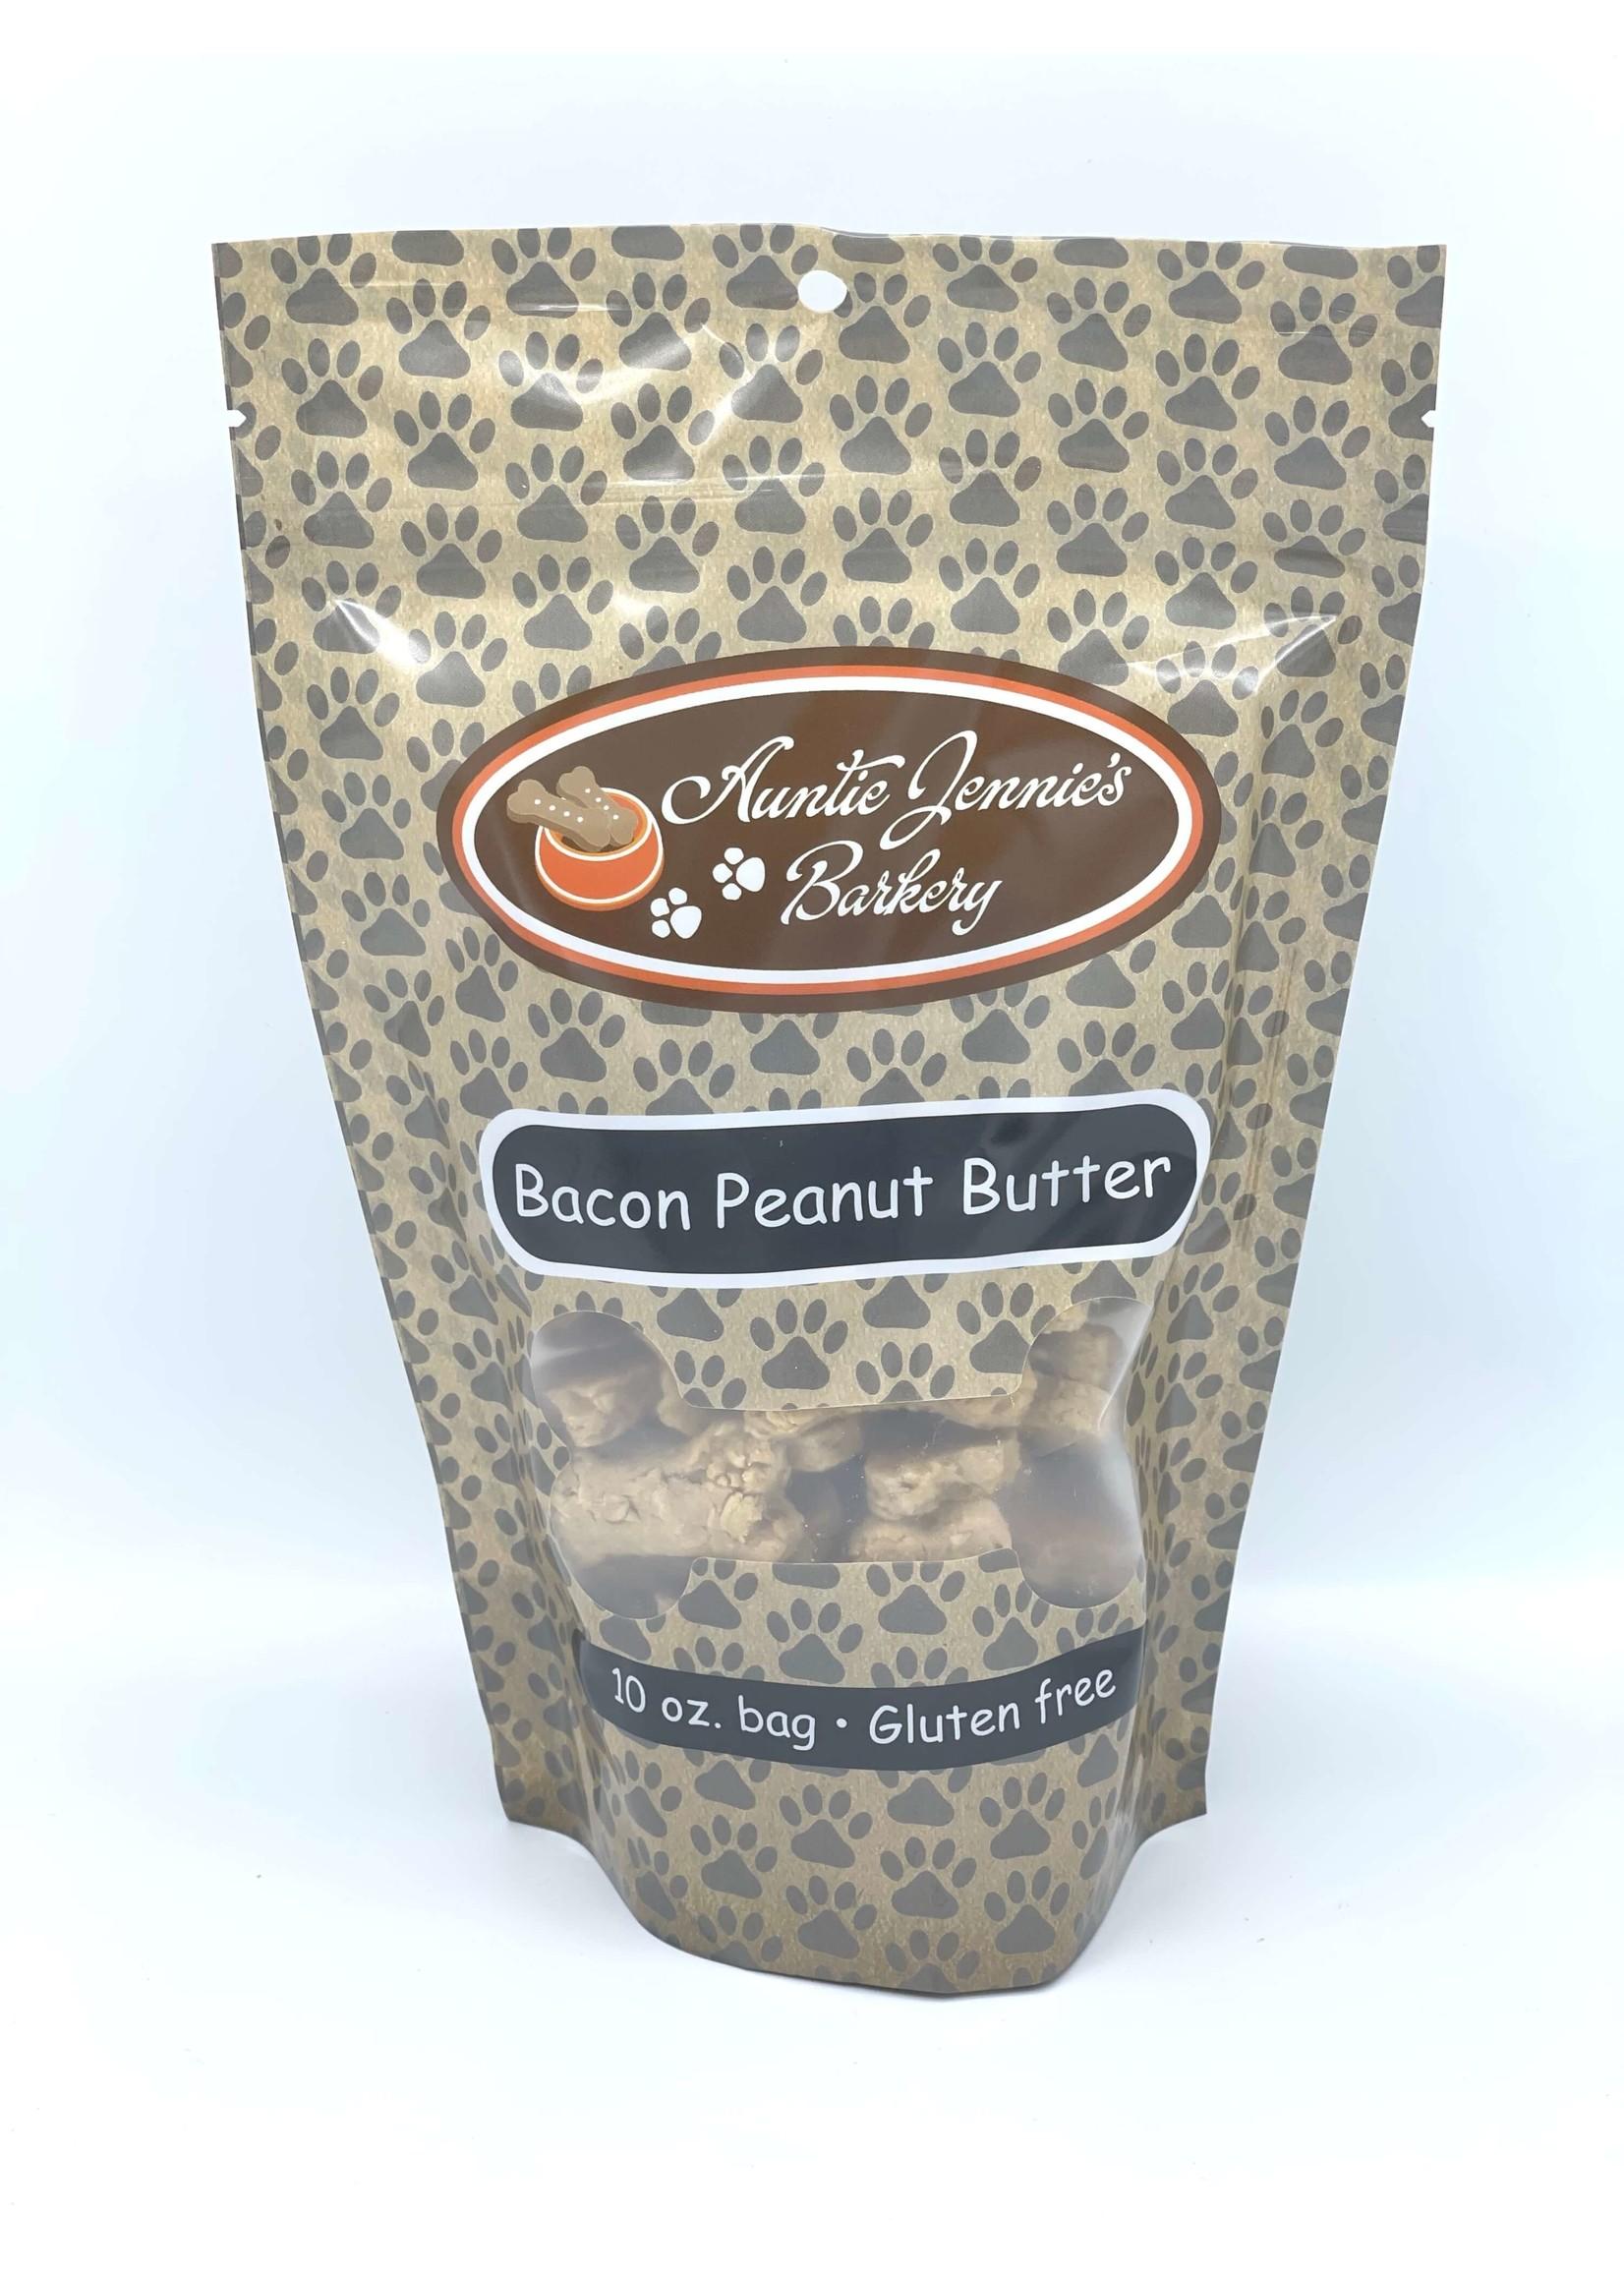 Aunt Jennie's Barkery Bacon Peanut Butter Flavor